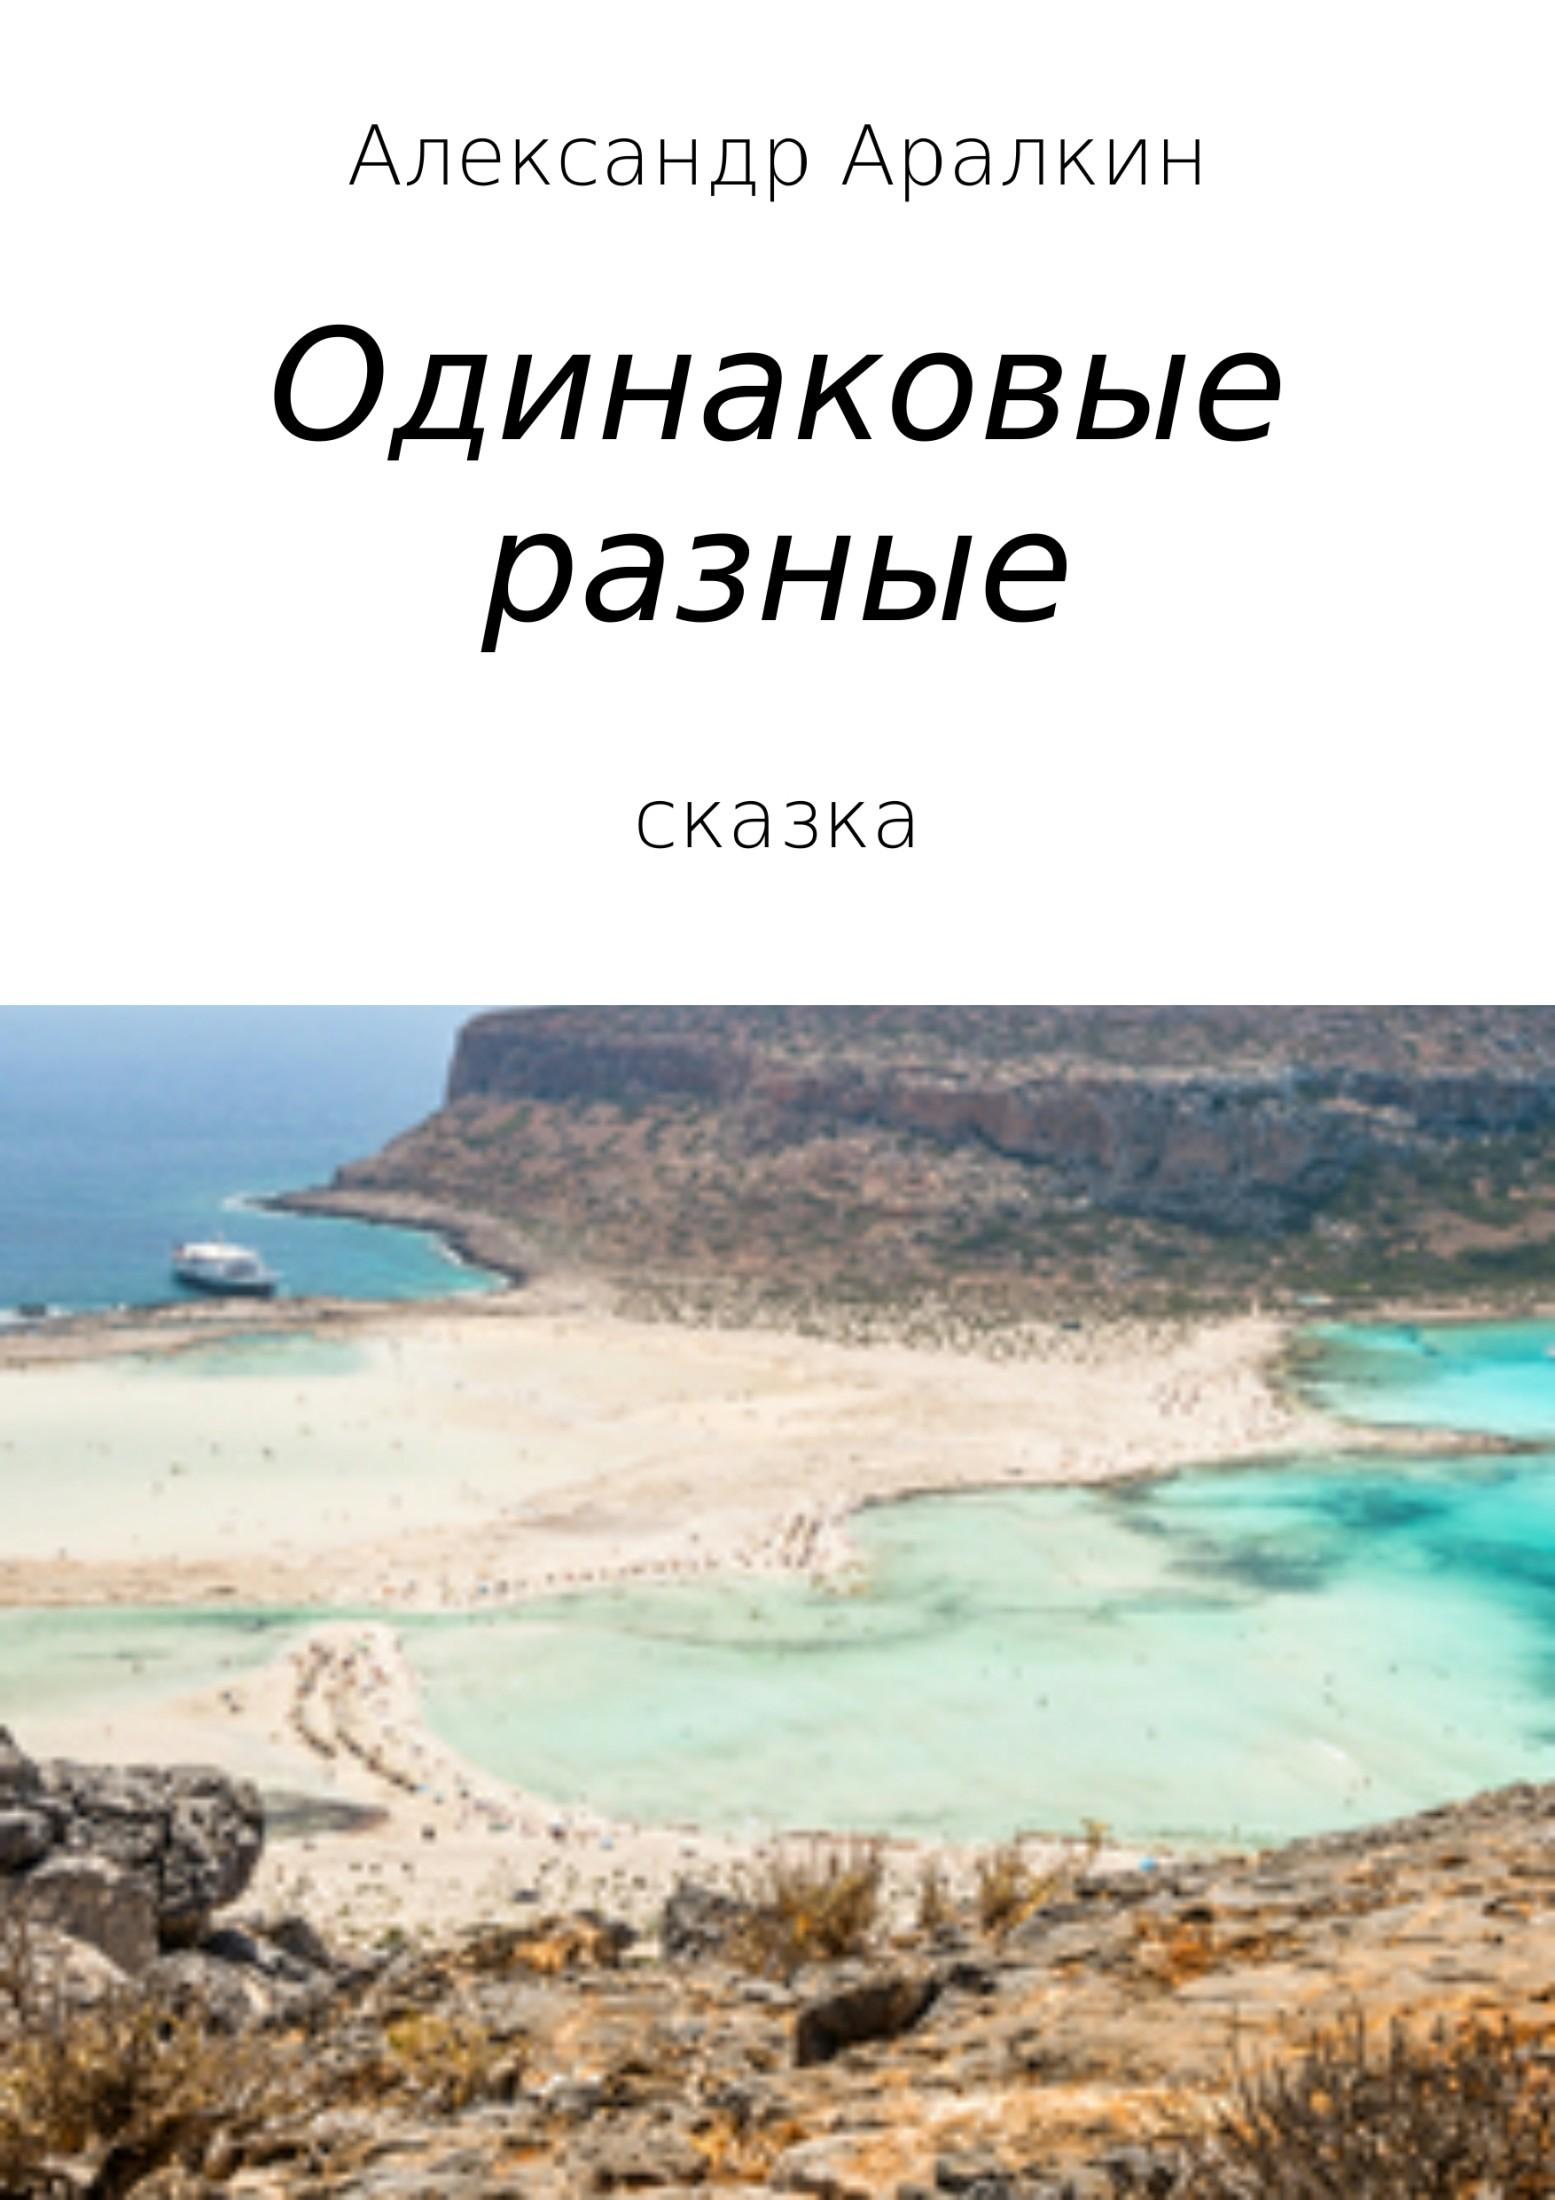 Александр Валерьевич Аралкин Одинаковые разные алексей валерьевич палысаев дар